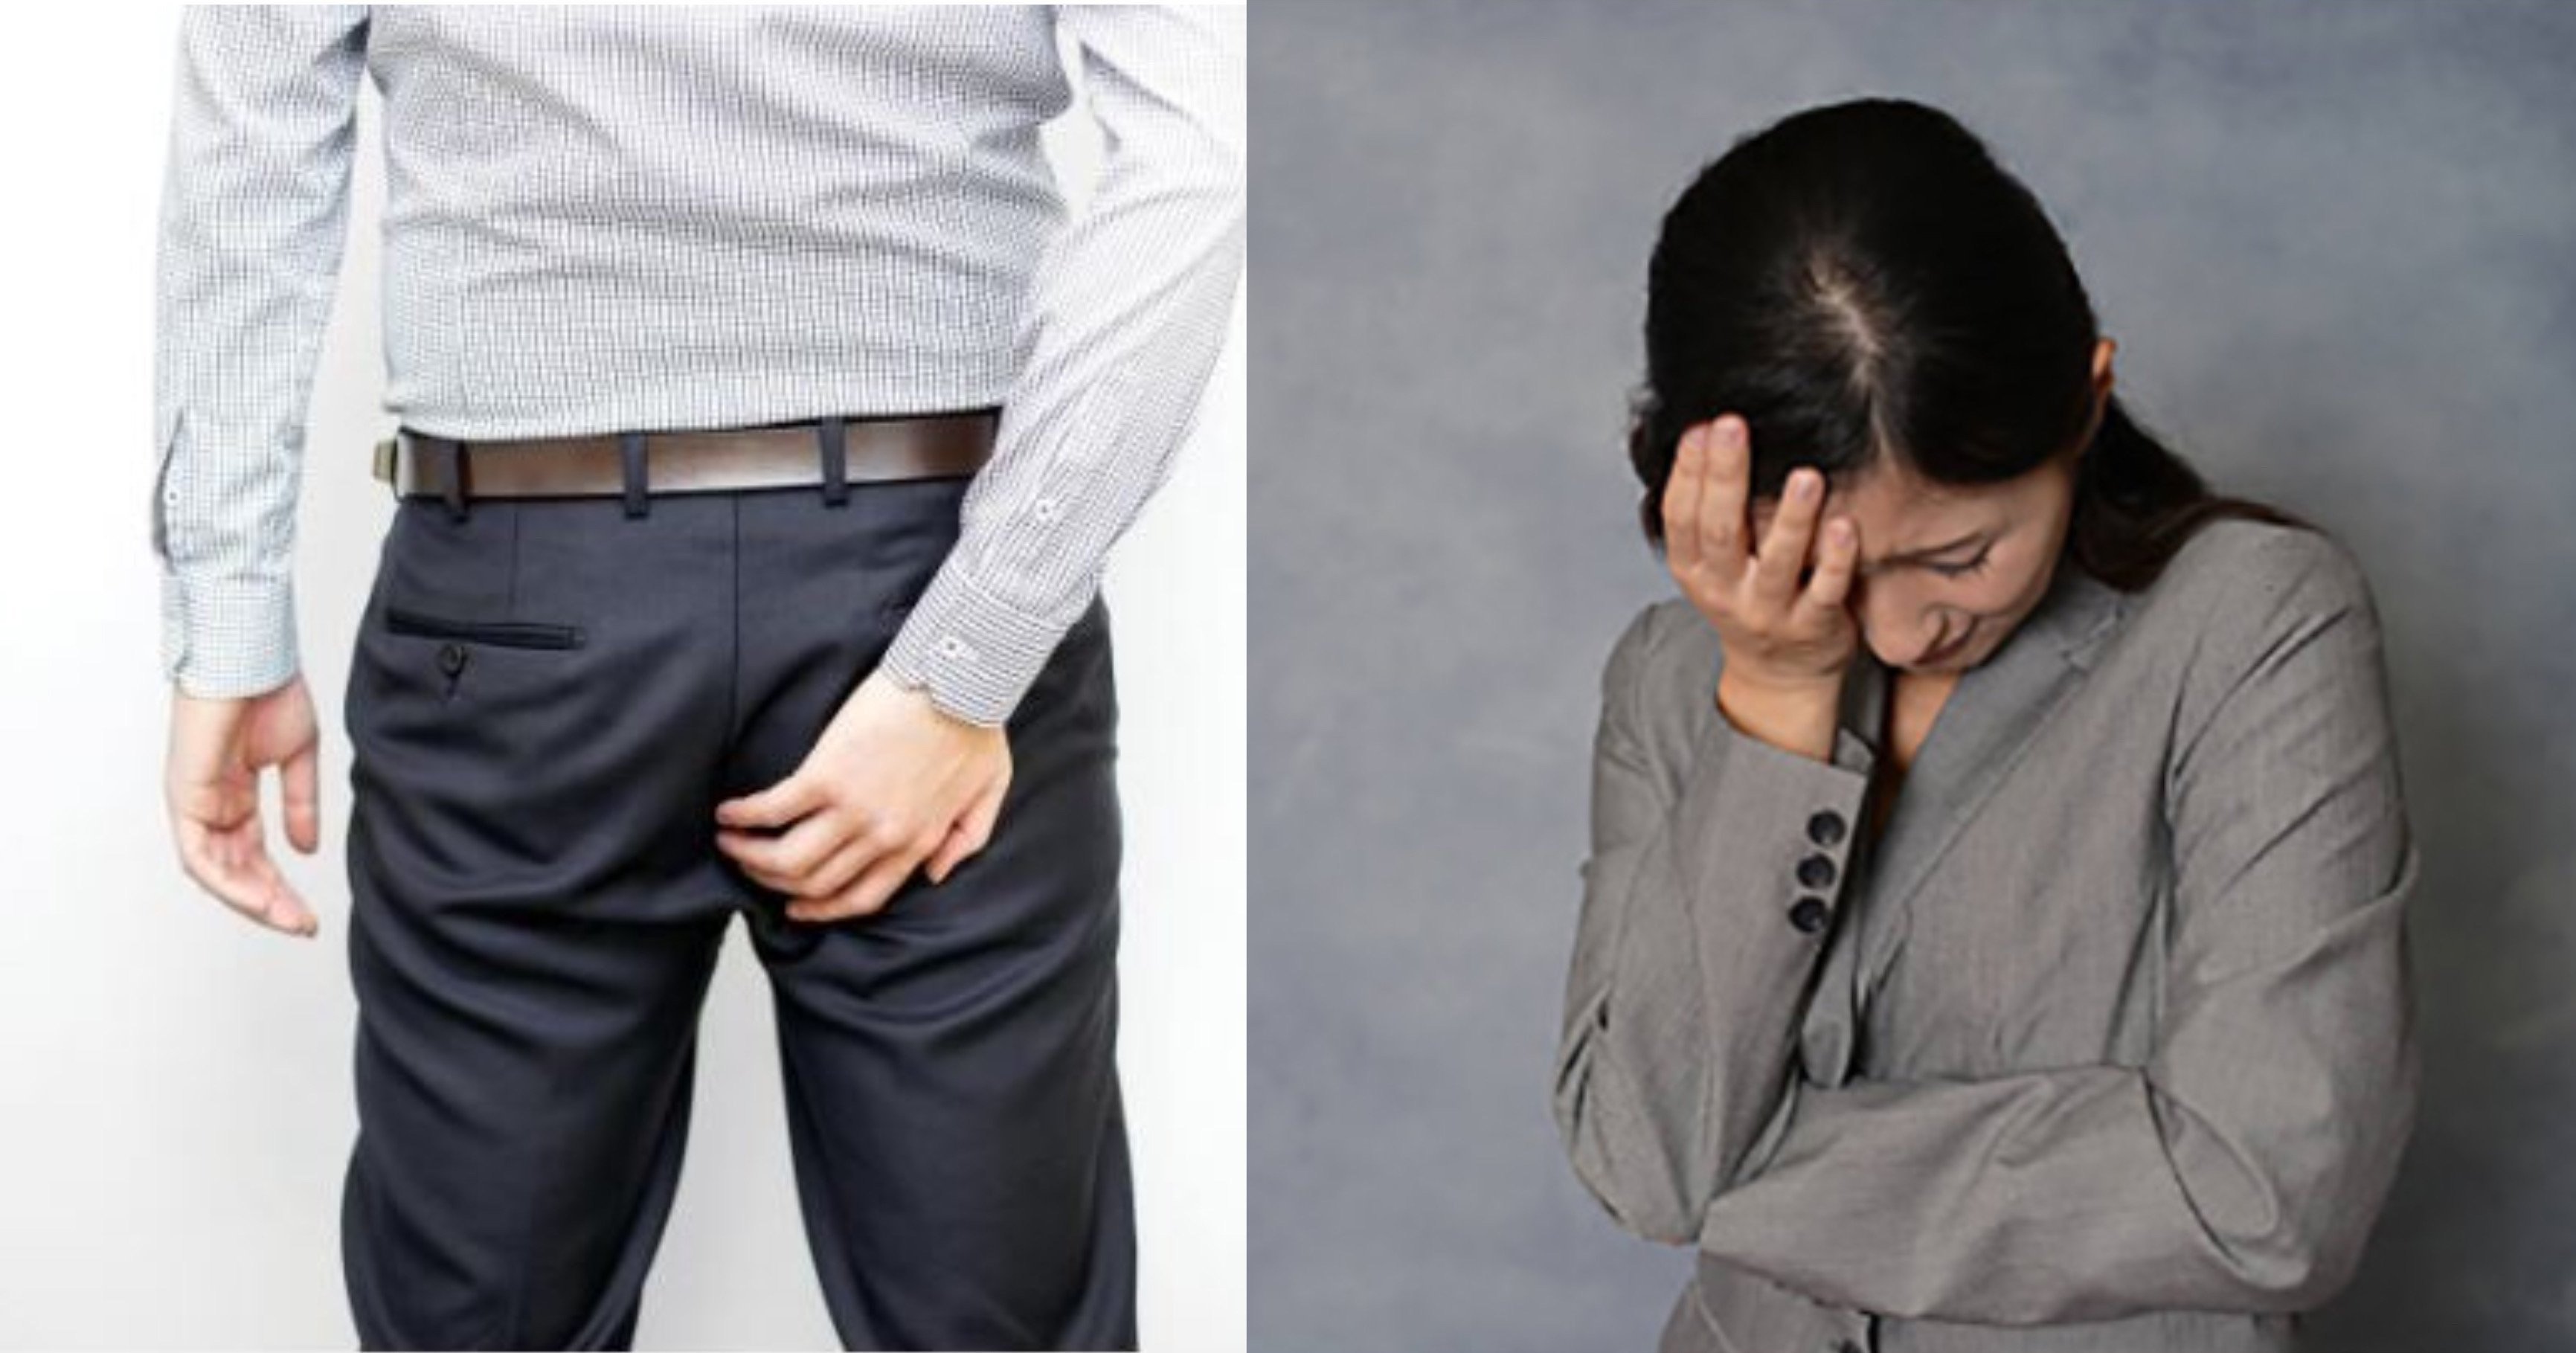 "ebb0a9eab780 ec8db8eb84ac.jpg?resize=412,232 - ""냄새 난다고!!!!...""...한 방에서 똥방귀 뀌는 아빠에게 분노해 얼굴 피날 때까지 폭행한 여성"